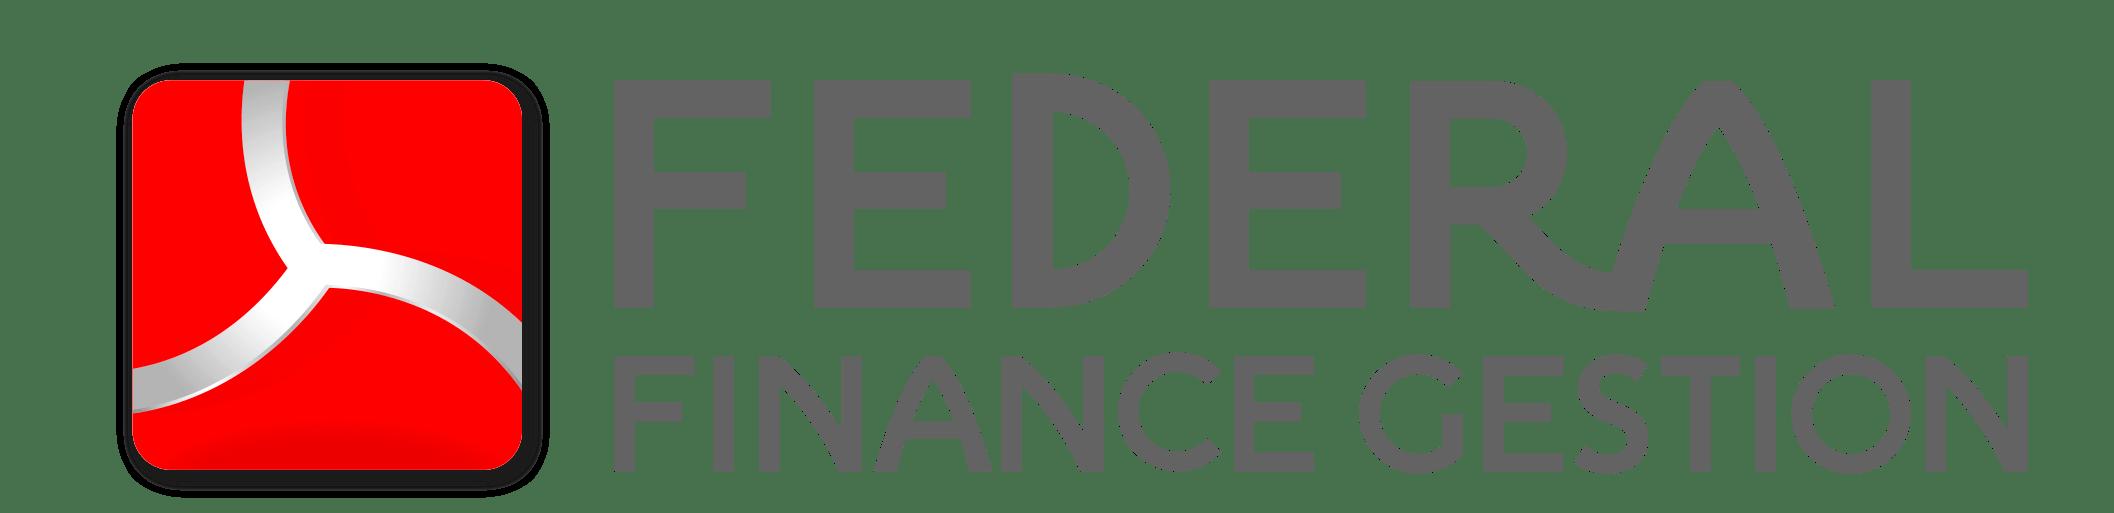 Féderal finance gestion et Epsor